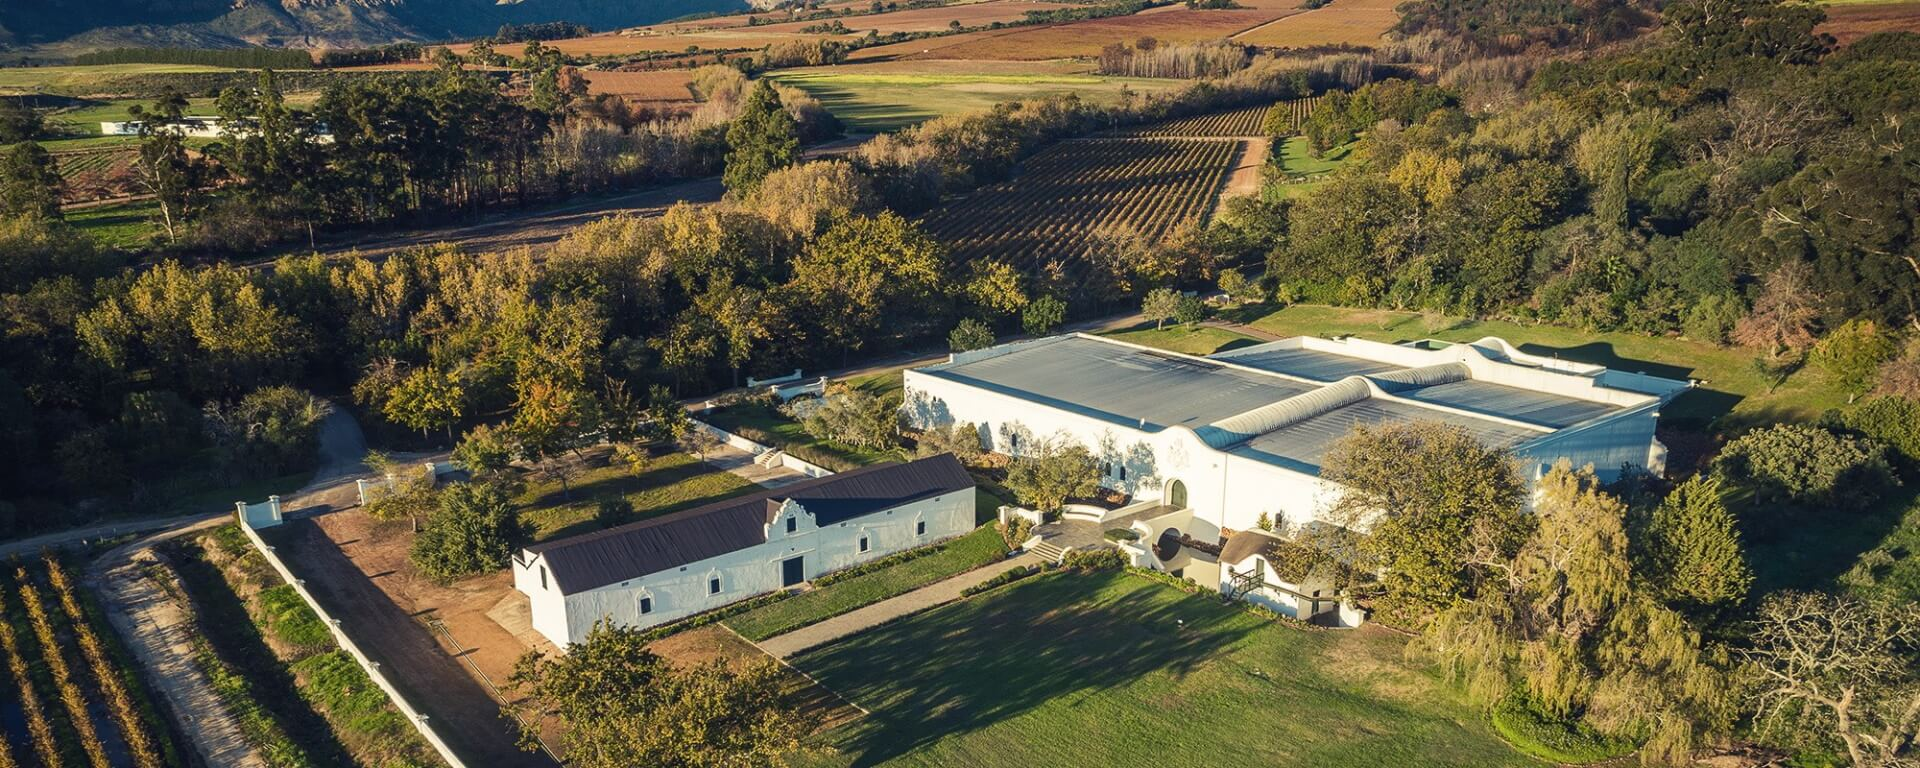 Aerial view of Plaisir de Merle's wine cellar in the Franschhoek winelands